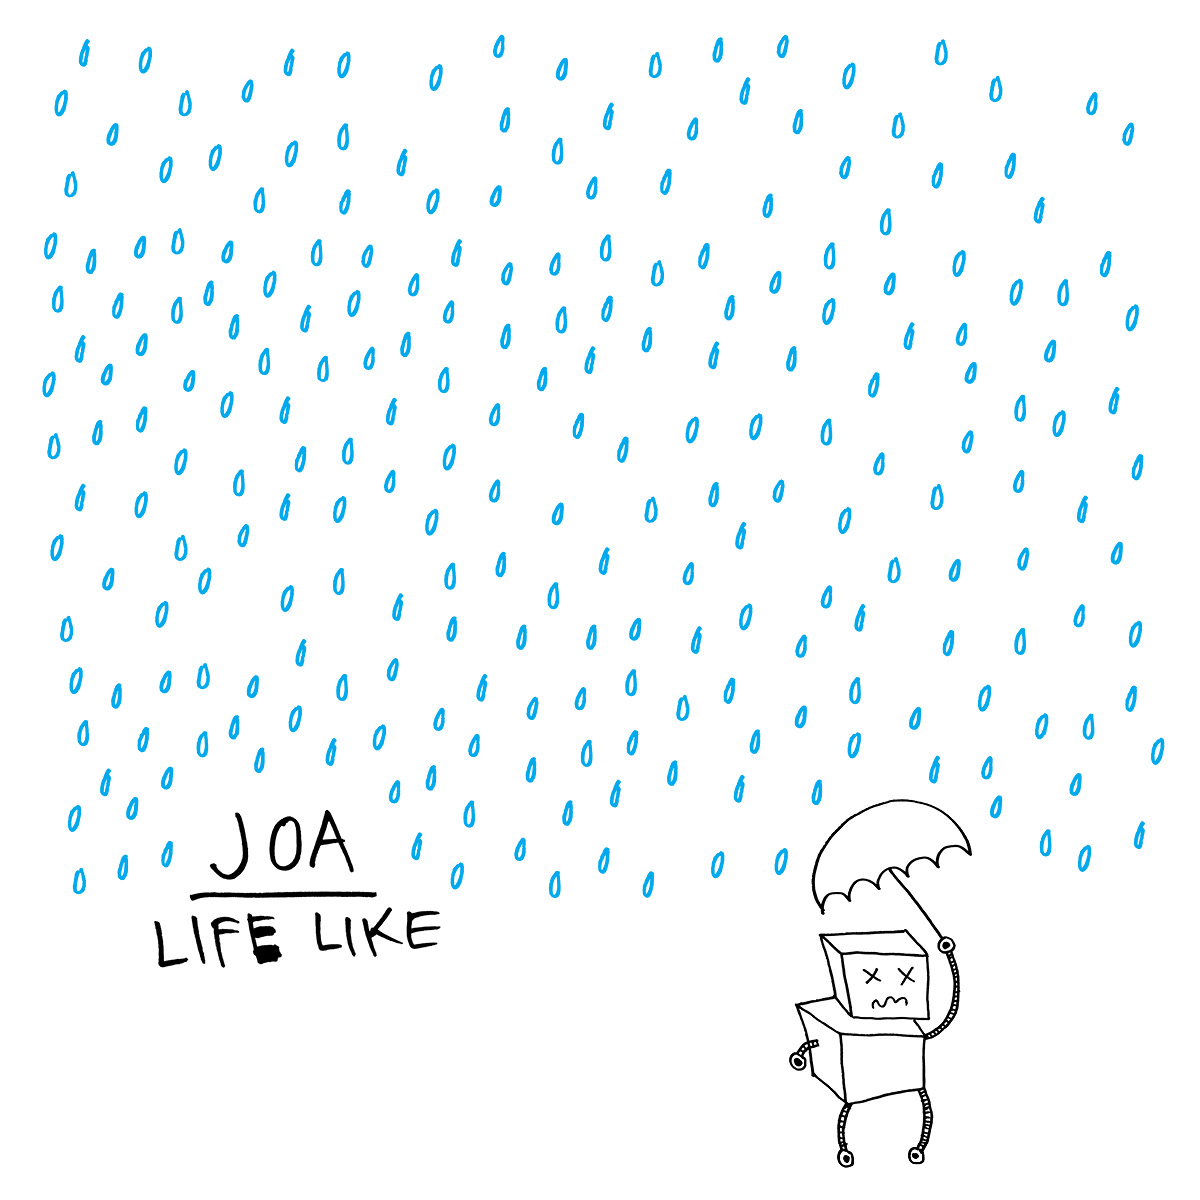 JOA_Life_Like.jpg